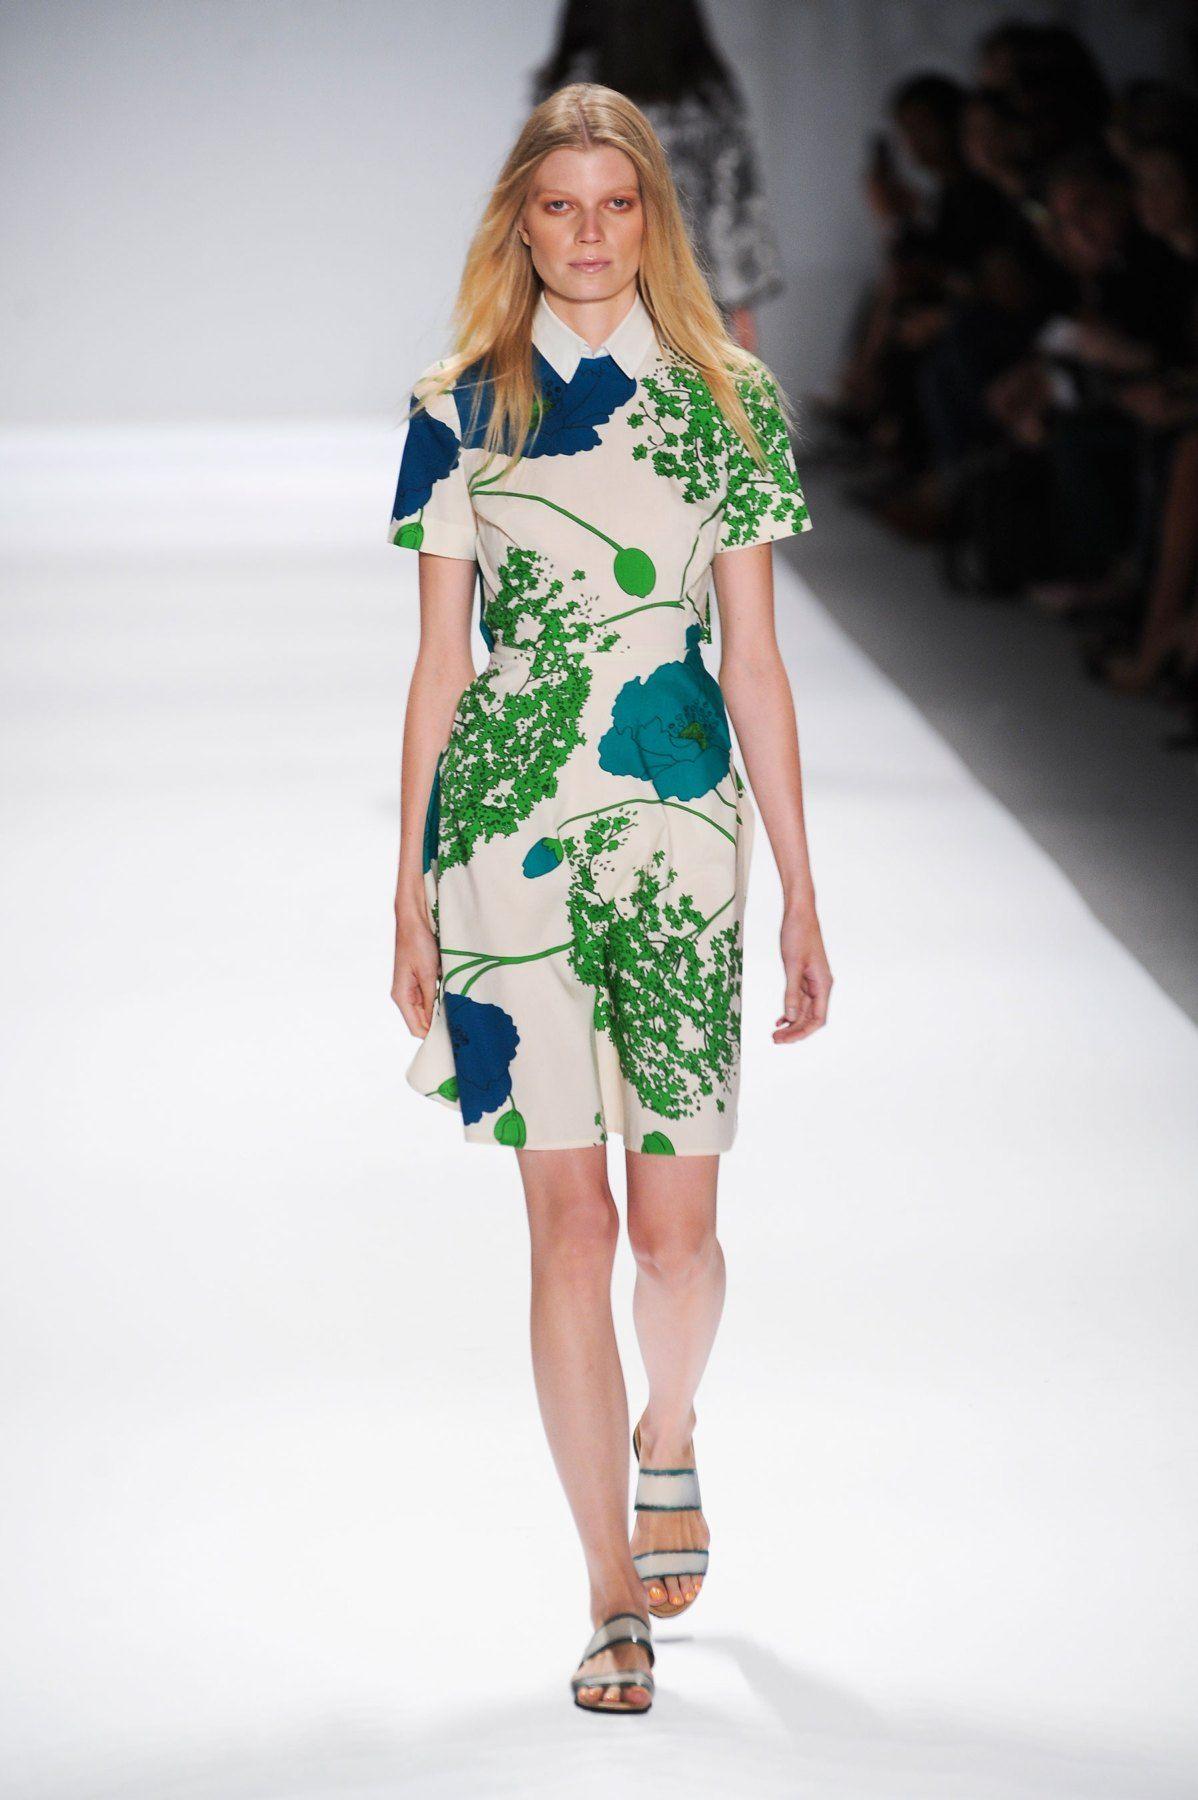 Vivienne Tam Nova York Verão 2014 RTW Ideias fashion